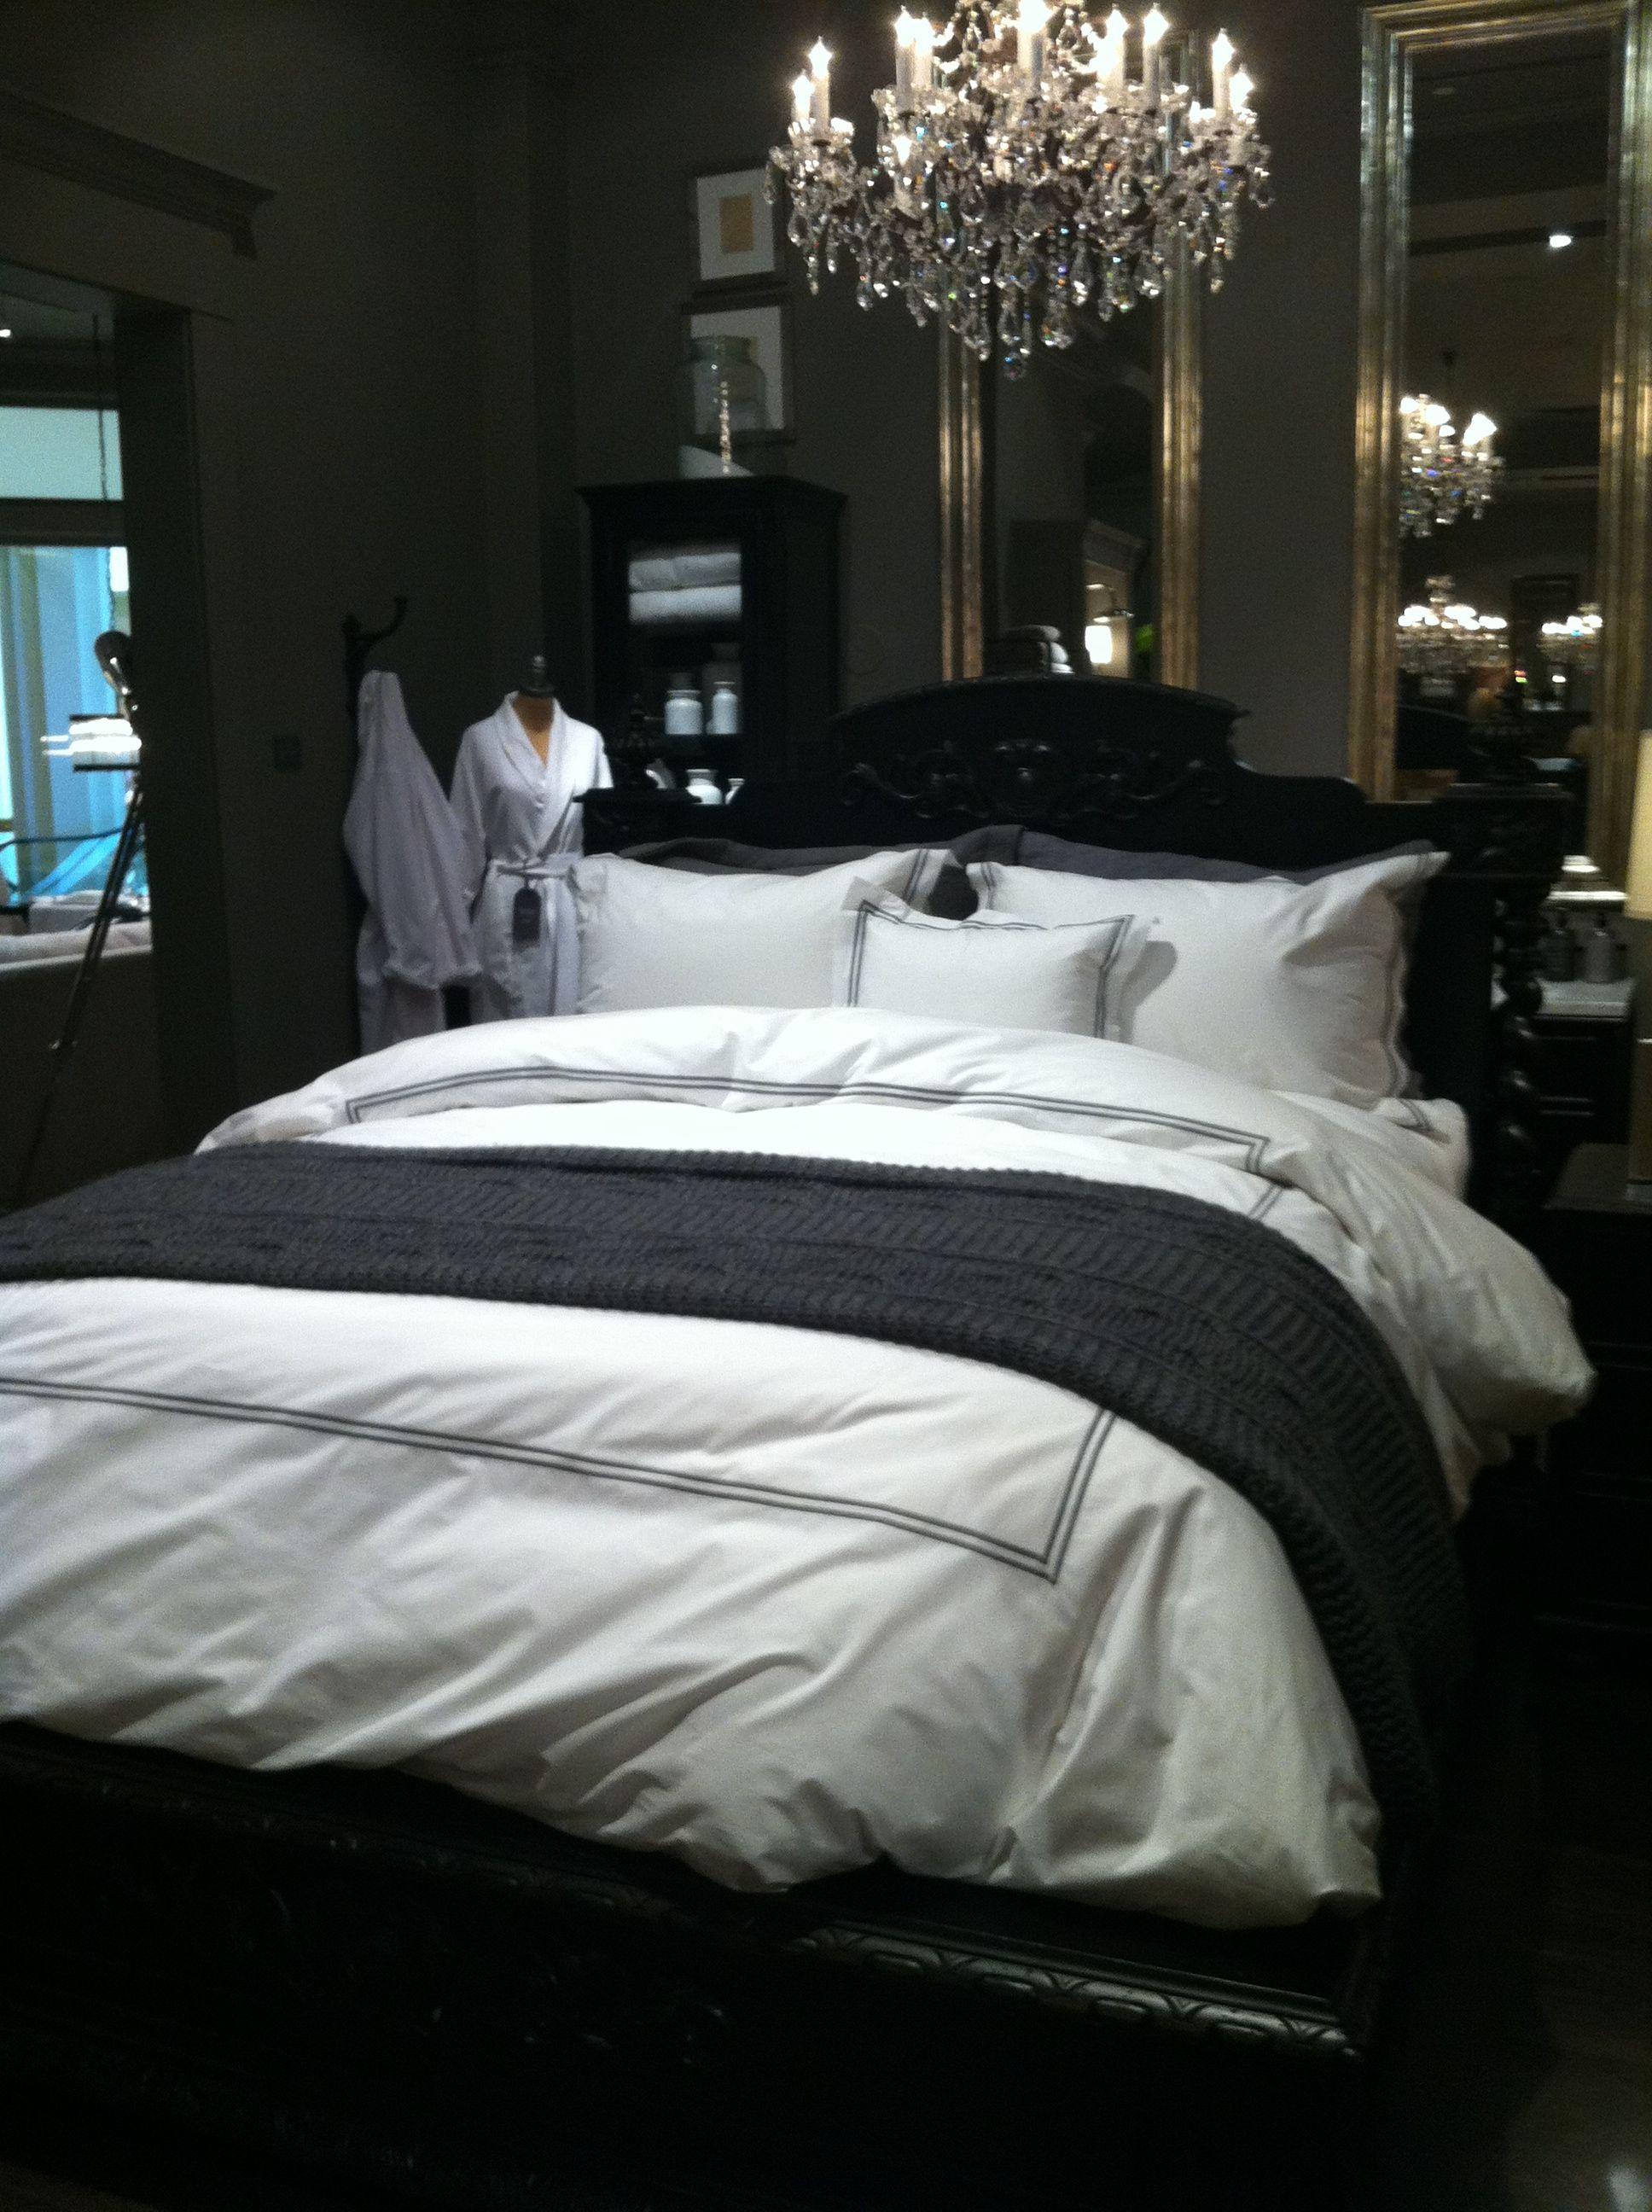 Gray & White Bedding at Restoration Hardware Showroom